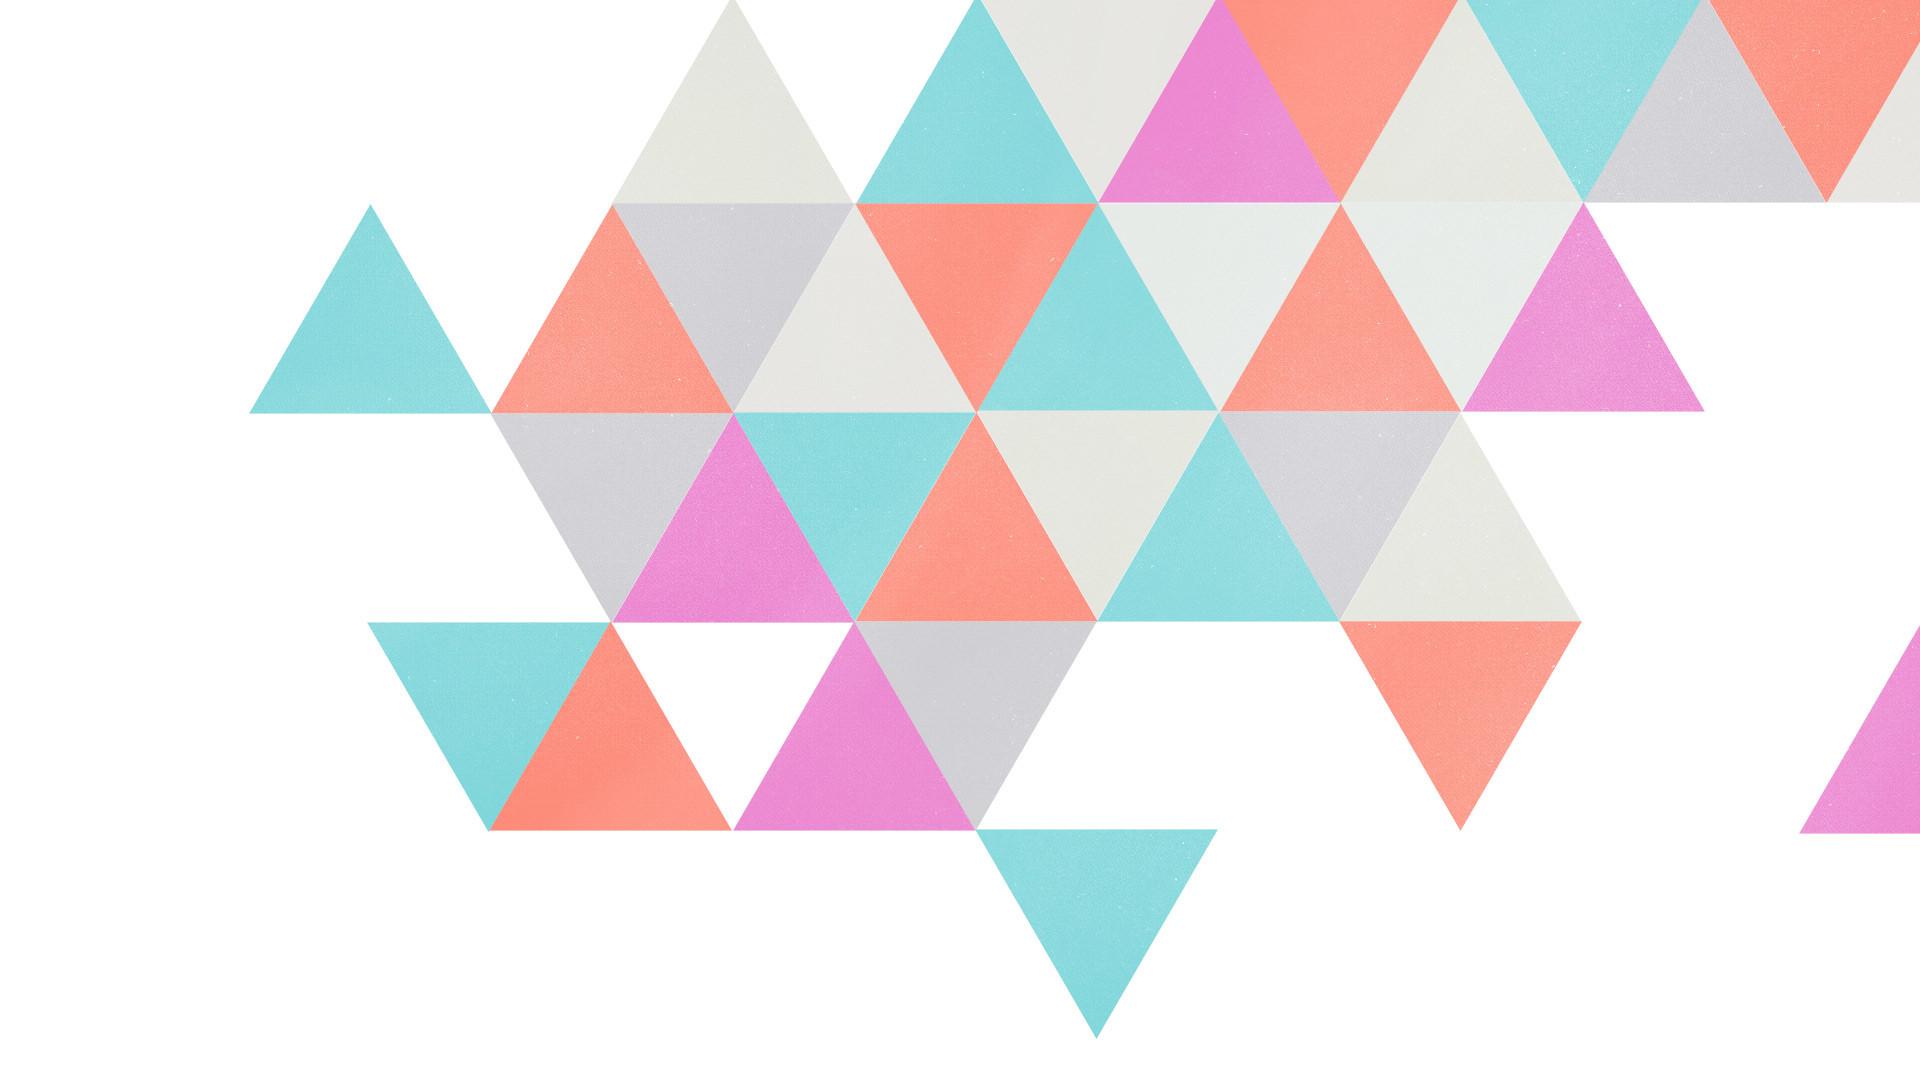 Desktop wallpaper | iPad wallpaper | iPhone wallpaper